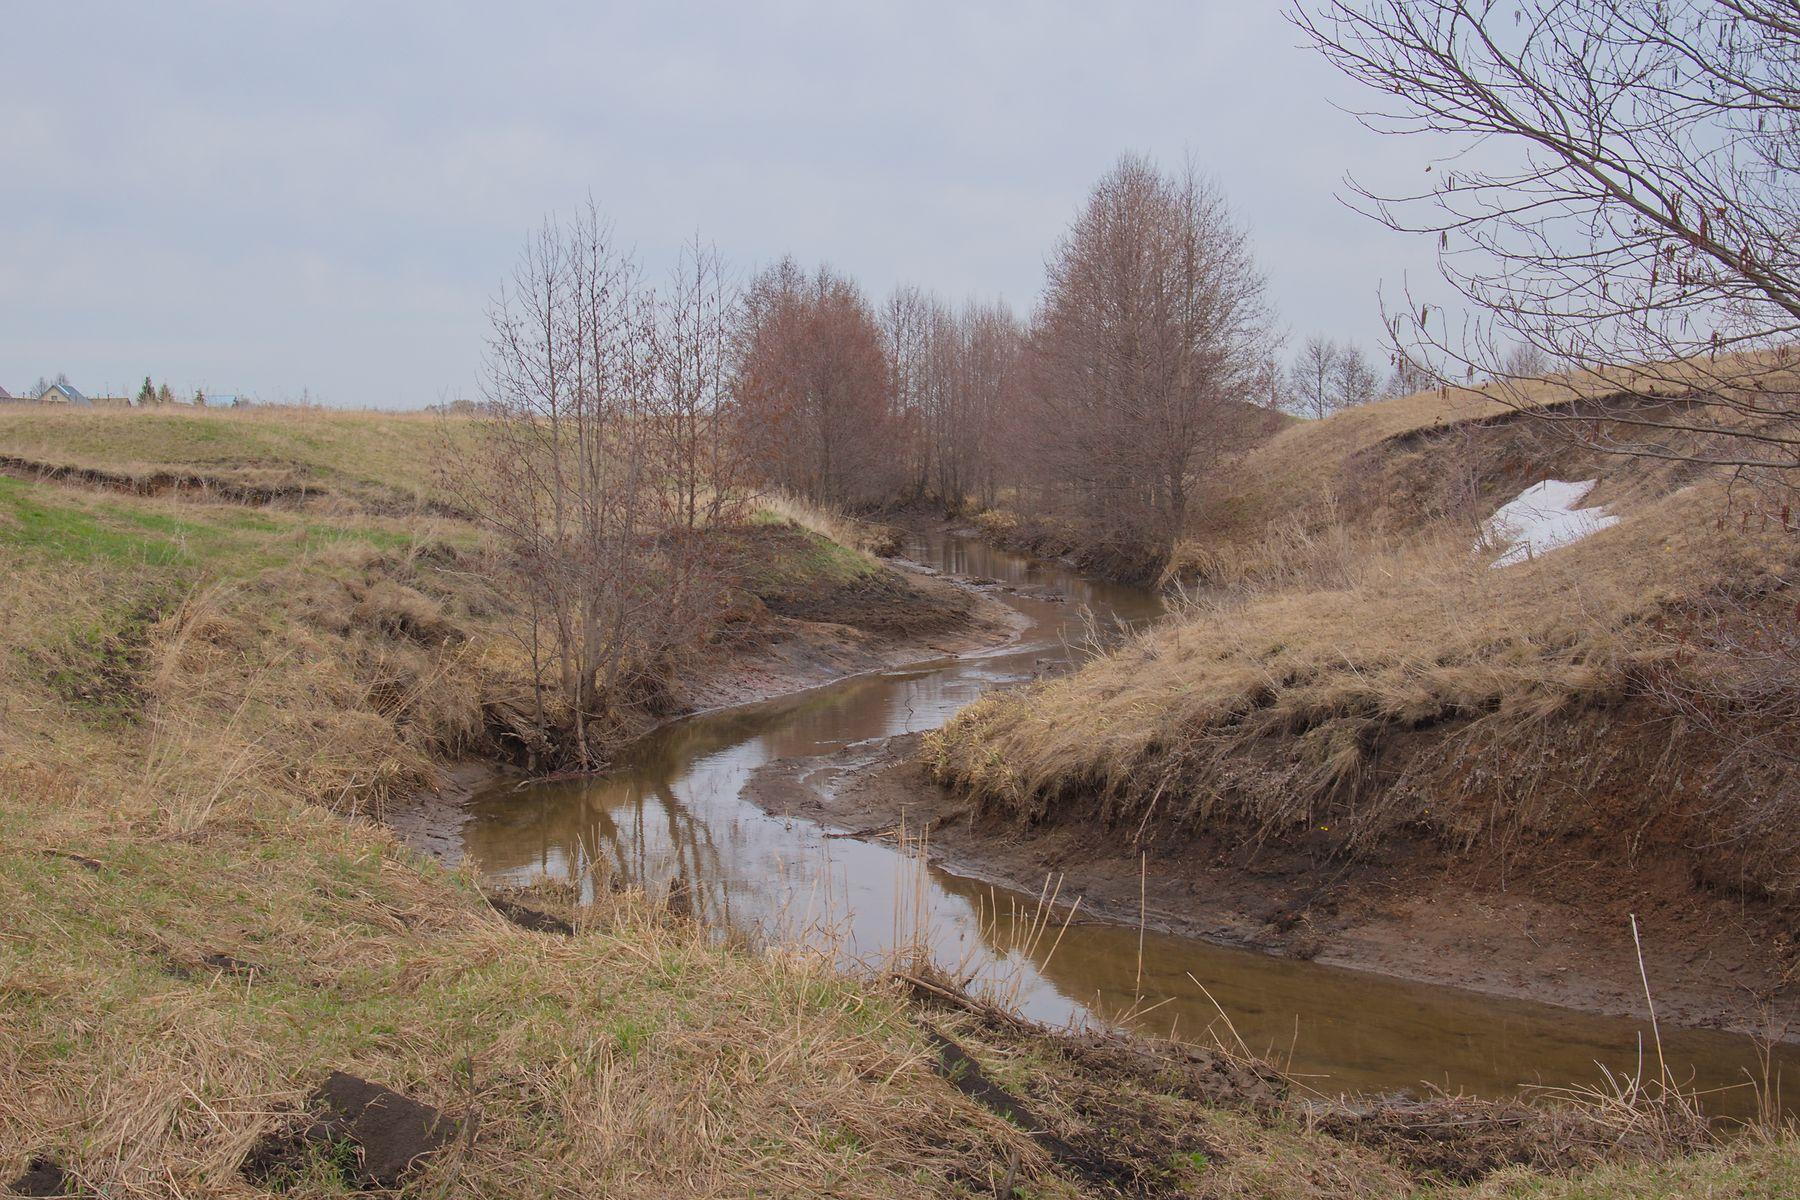 Обмелевшая речка Явбаза.